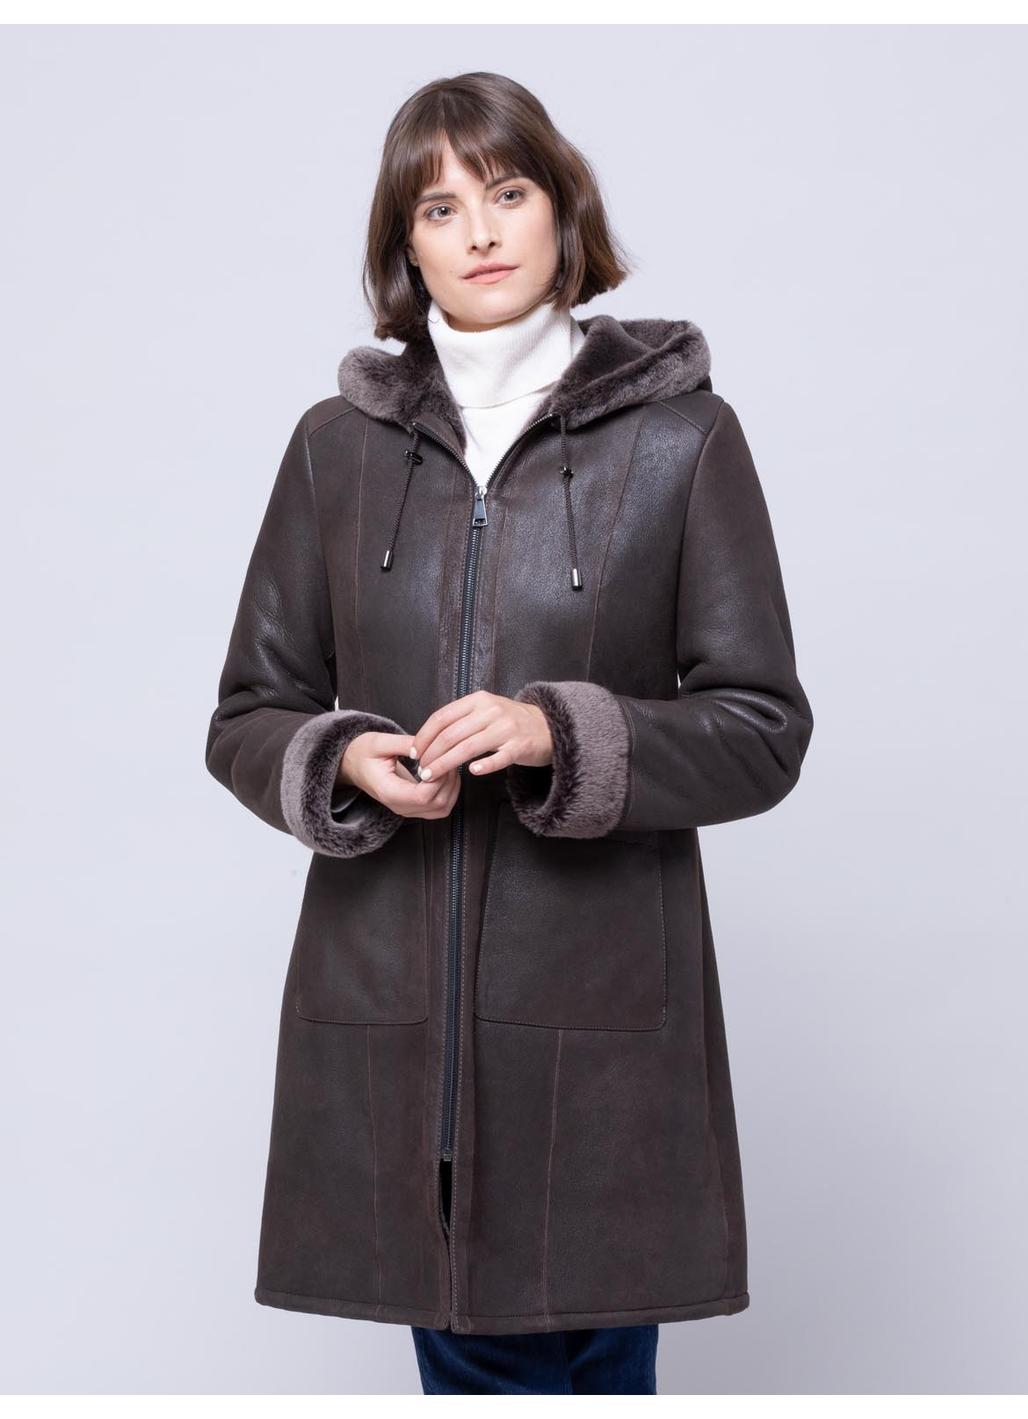 Plumpton Sheepskin Hooded Coat in Vole Brown